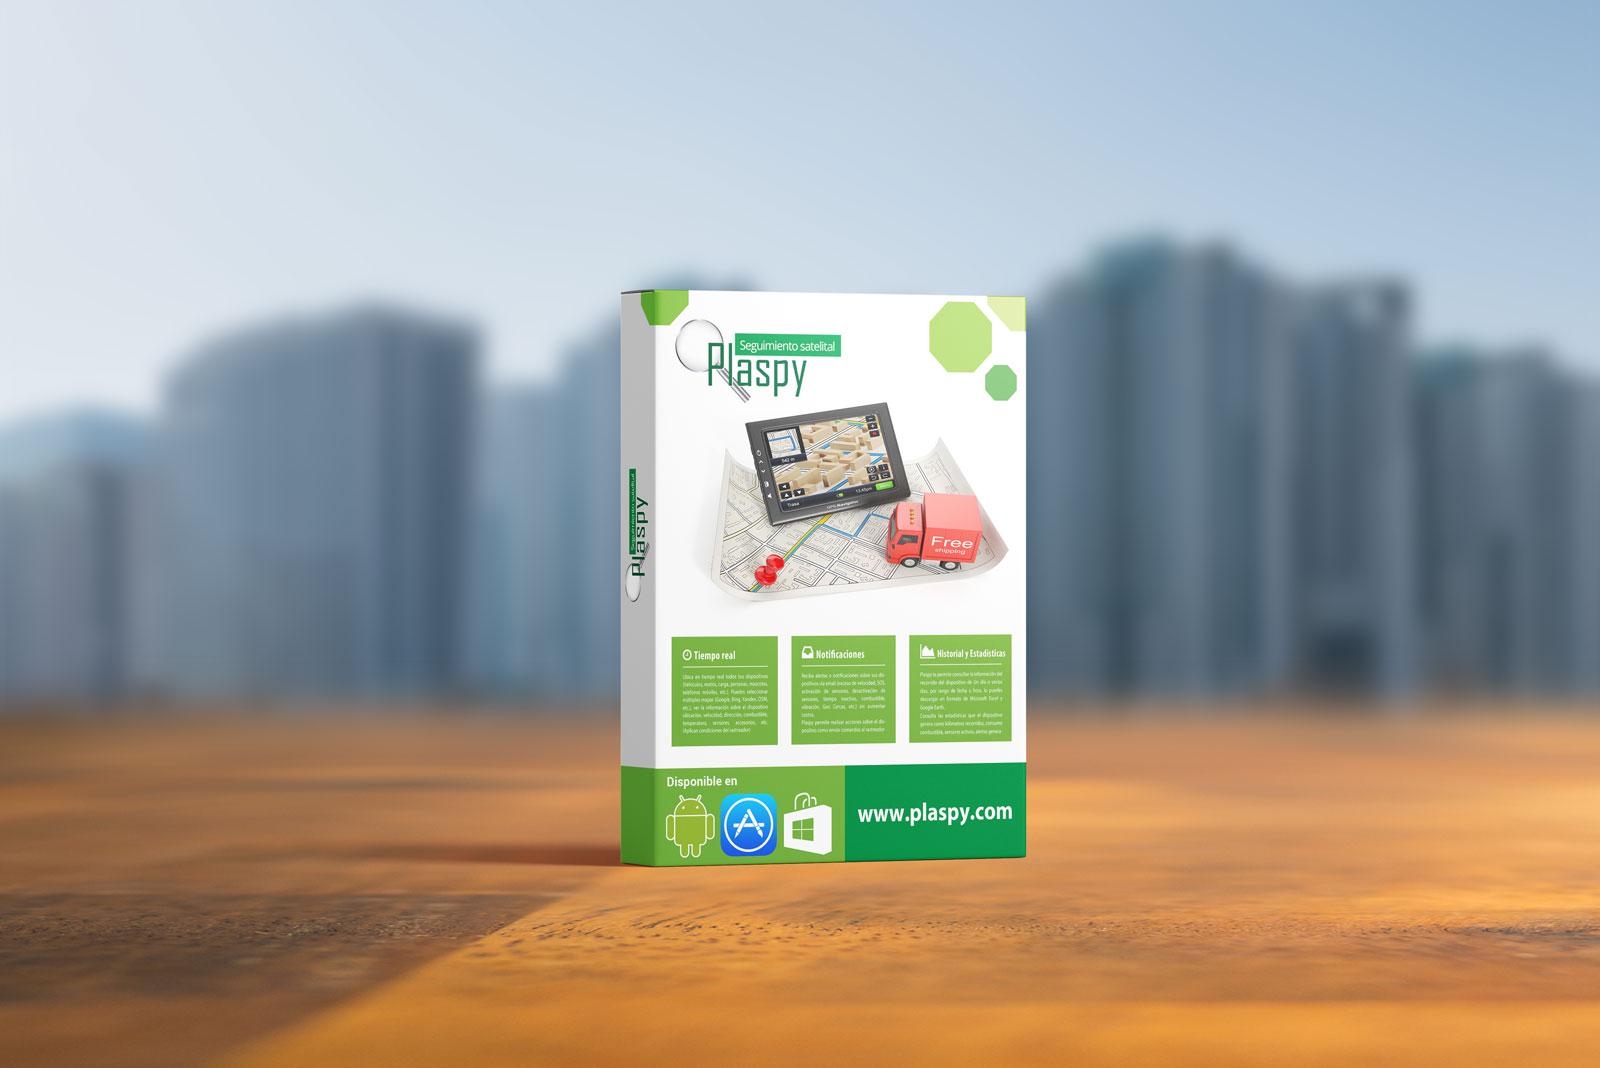 caja-plaspy